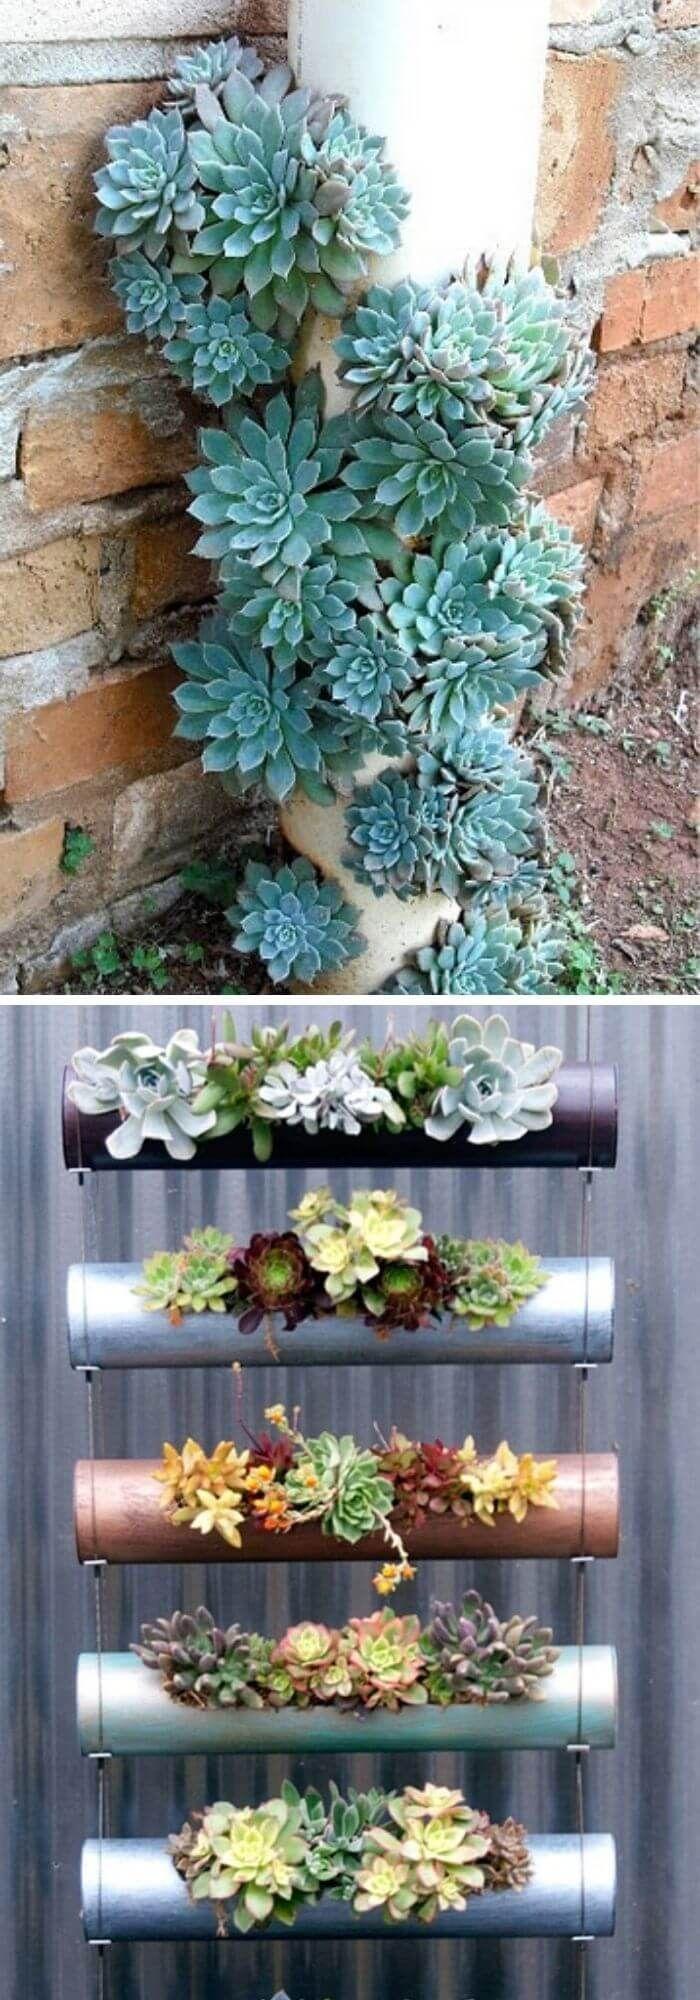 Photo of 20  Creative DIY Indoor and Outdoor Succulent Garden Ideas & Designs #creative #